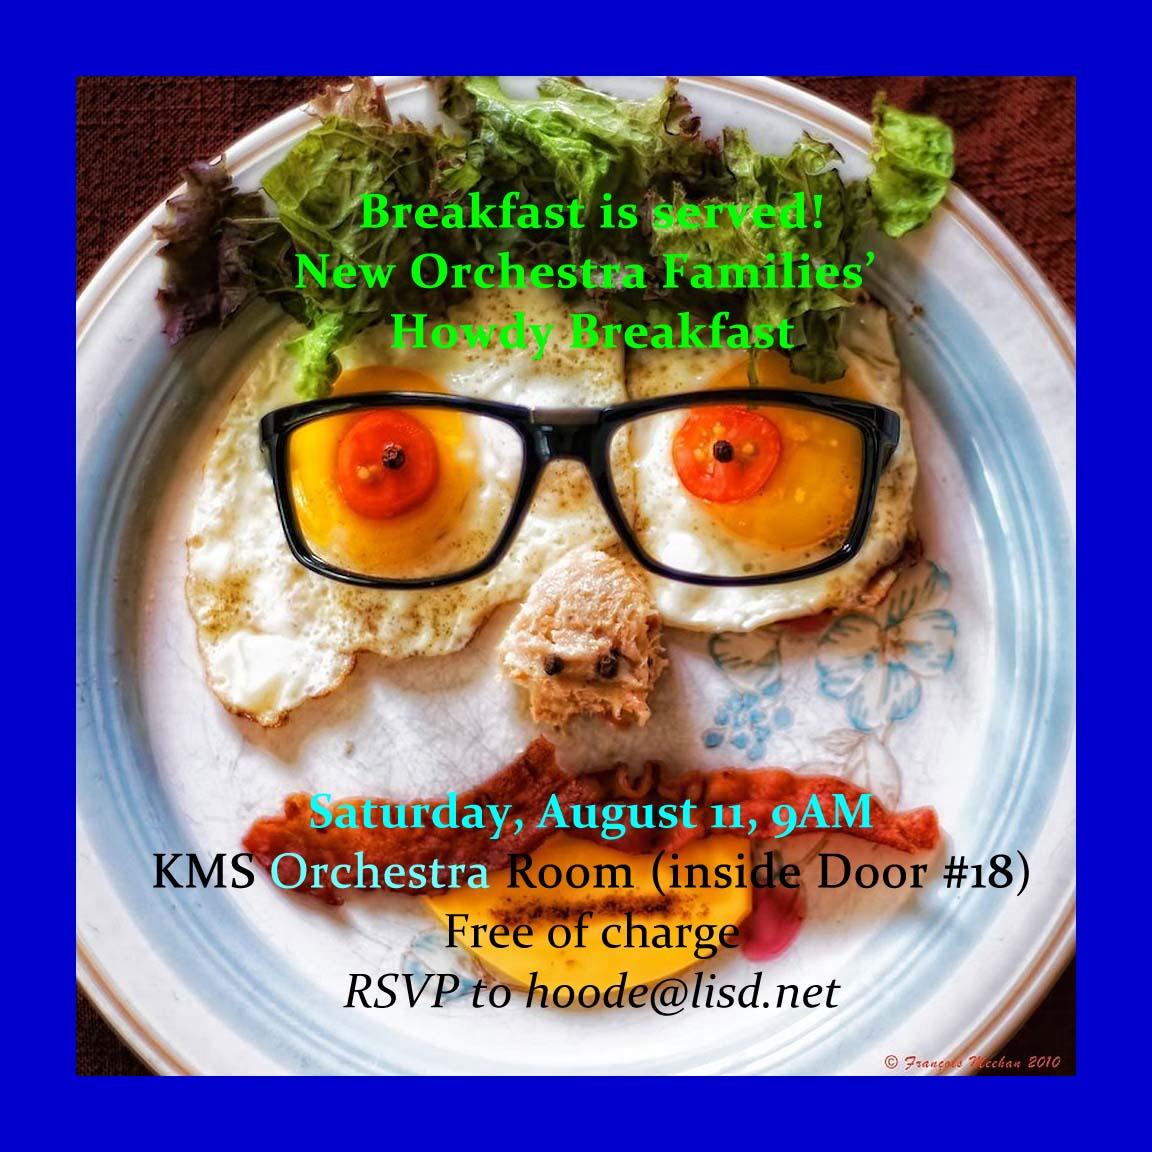 1819 Newcomers Breakfast Invite